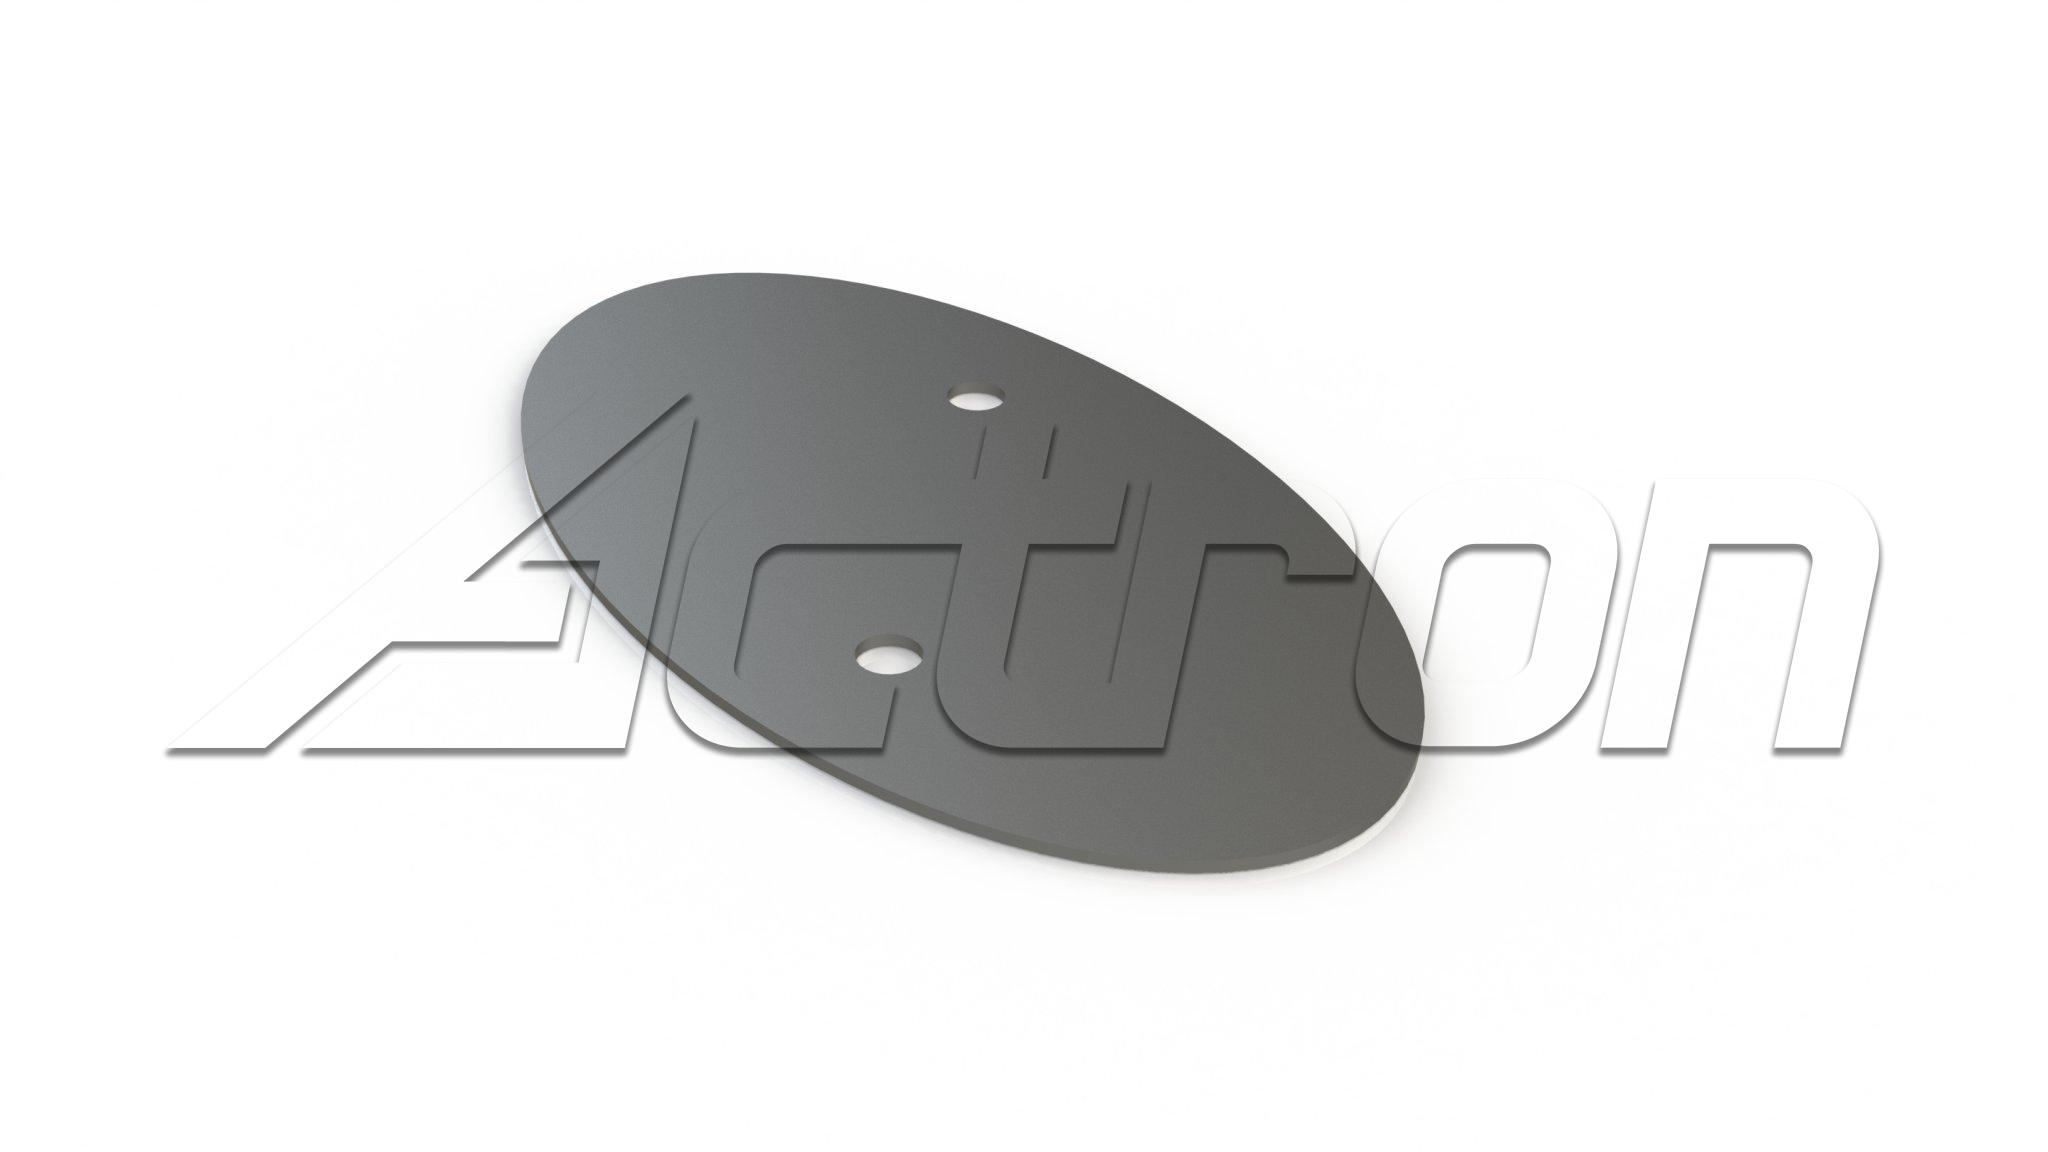 mounting-plate-8211-latch-5282-a44004.jpg